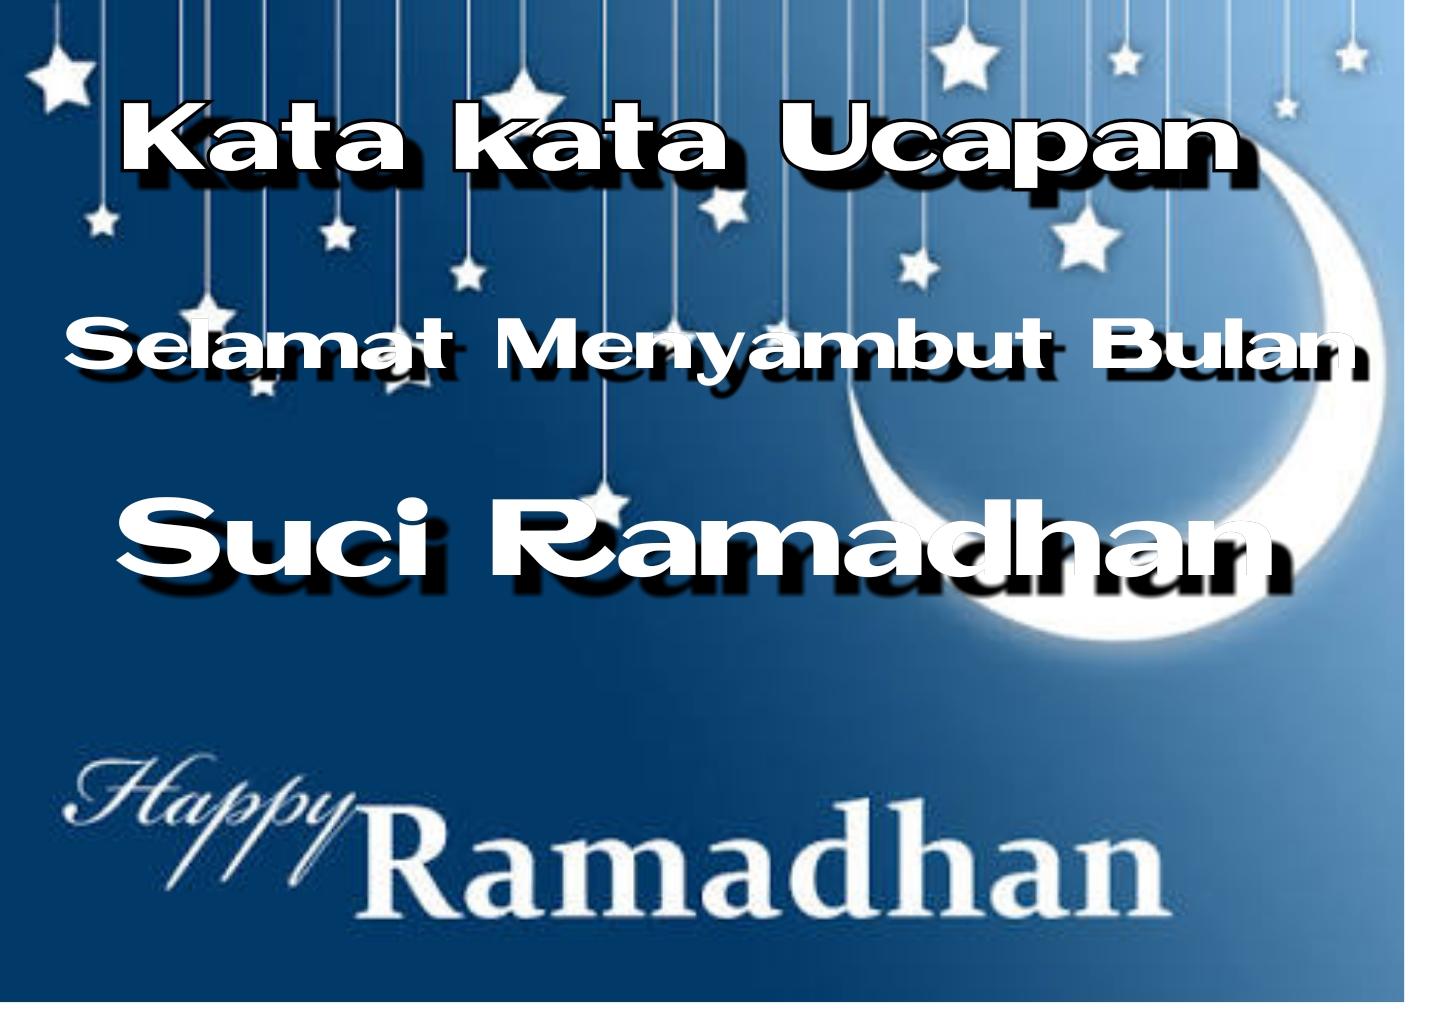 Kata Ucapan Bulan Suci Ramadhan Nusagates